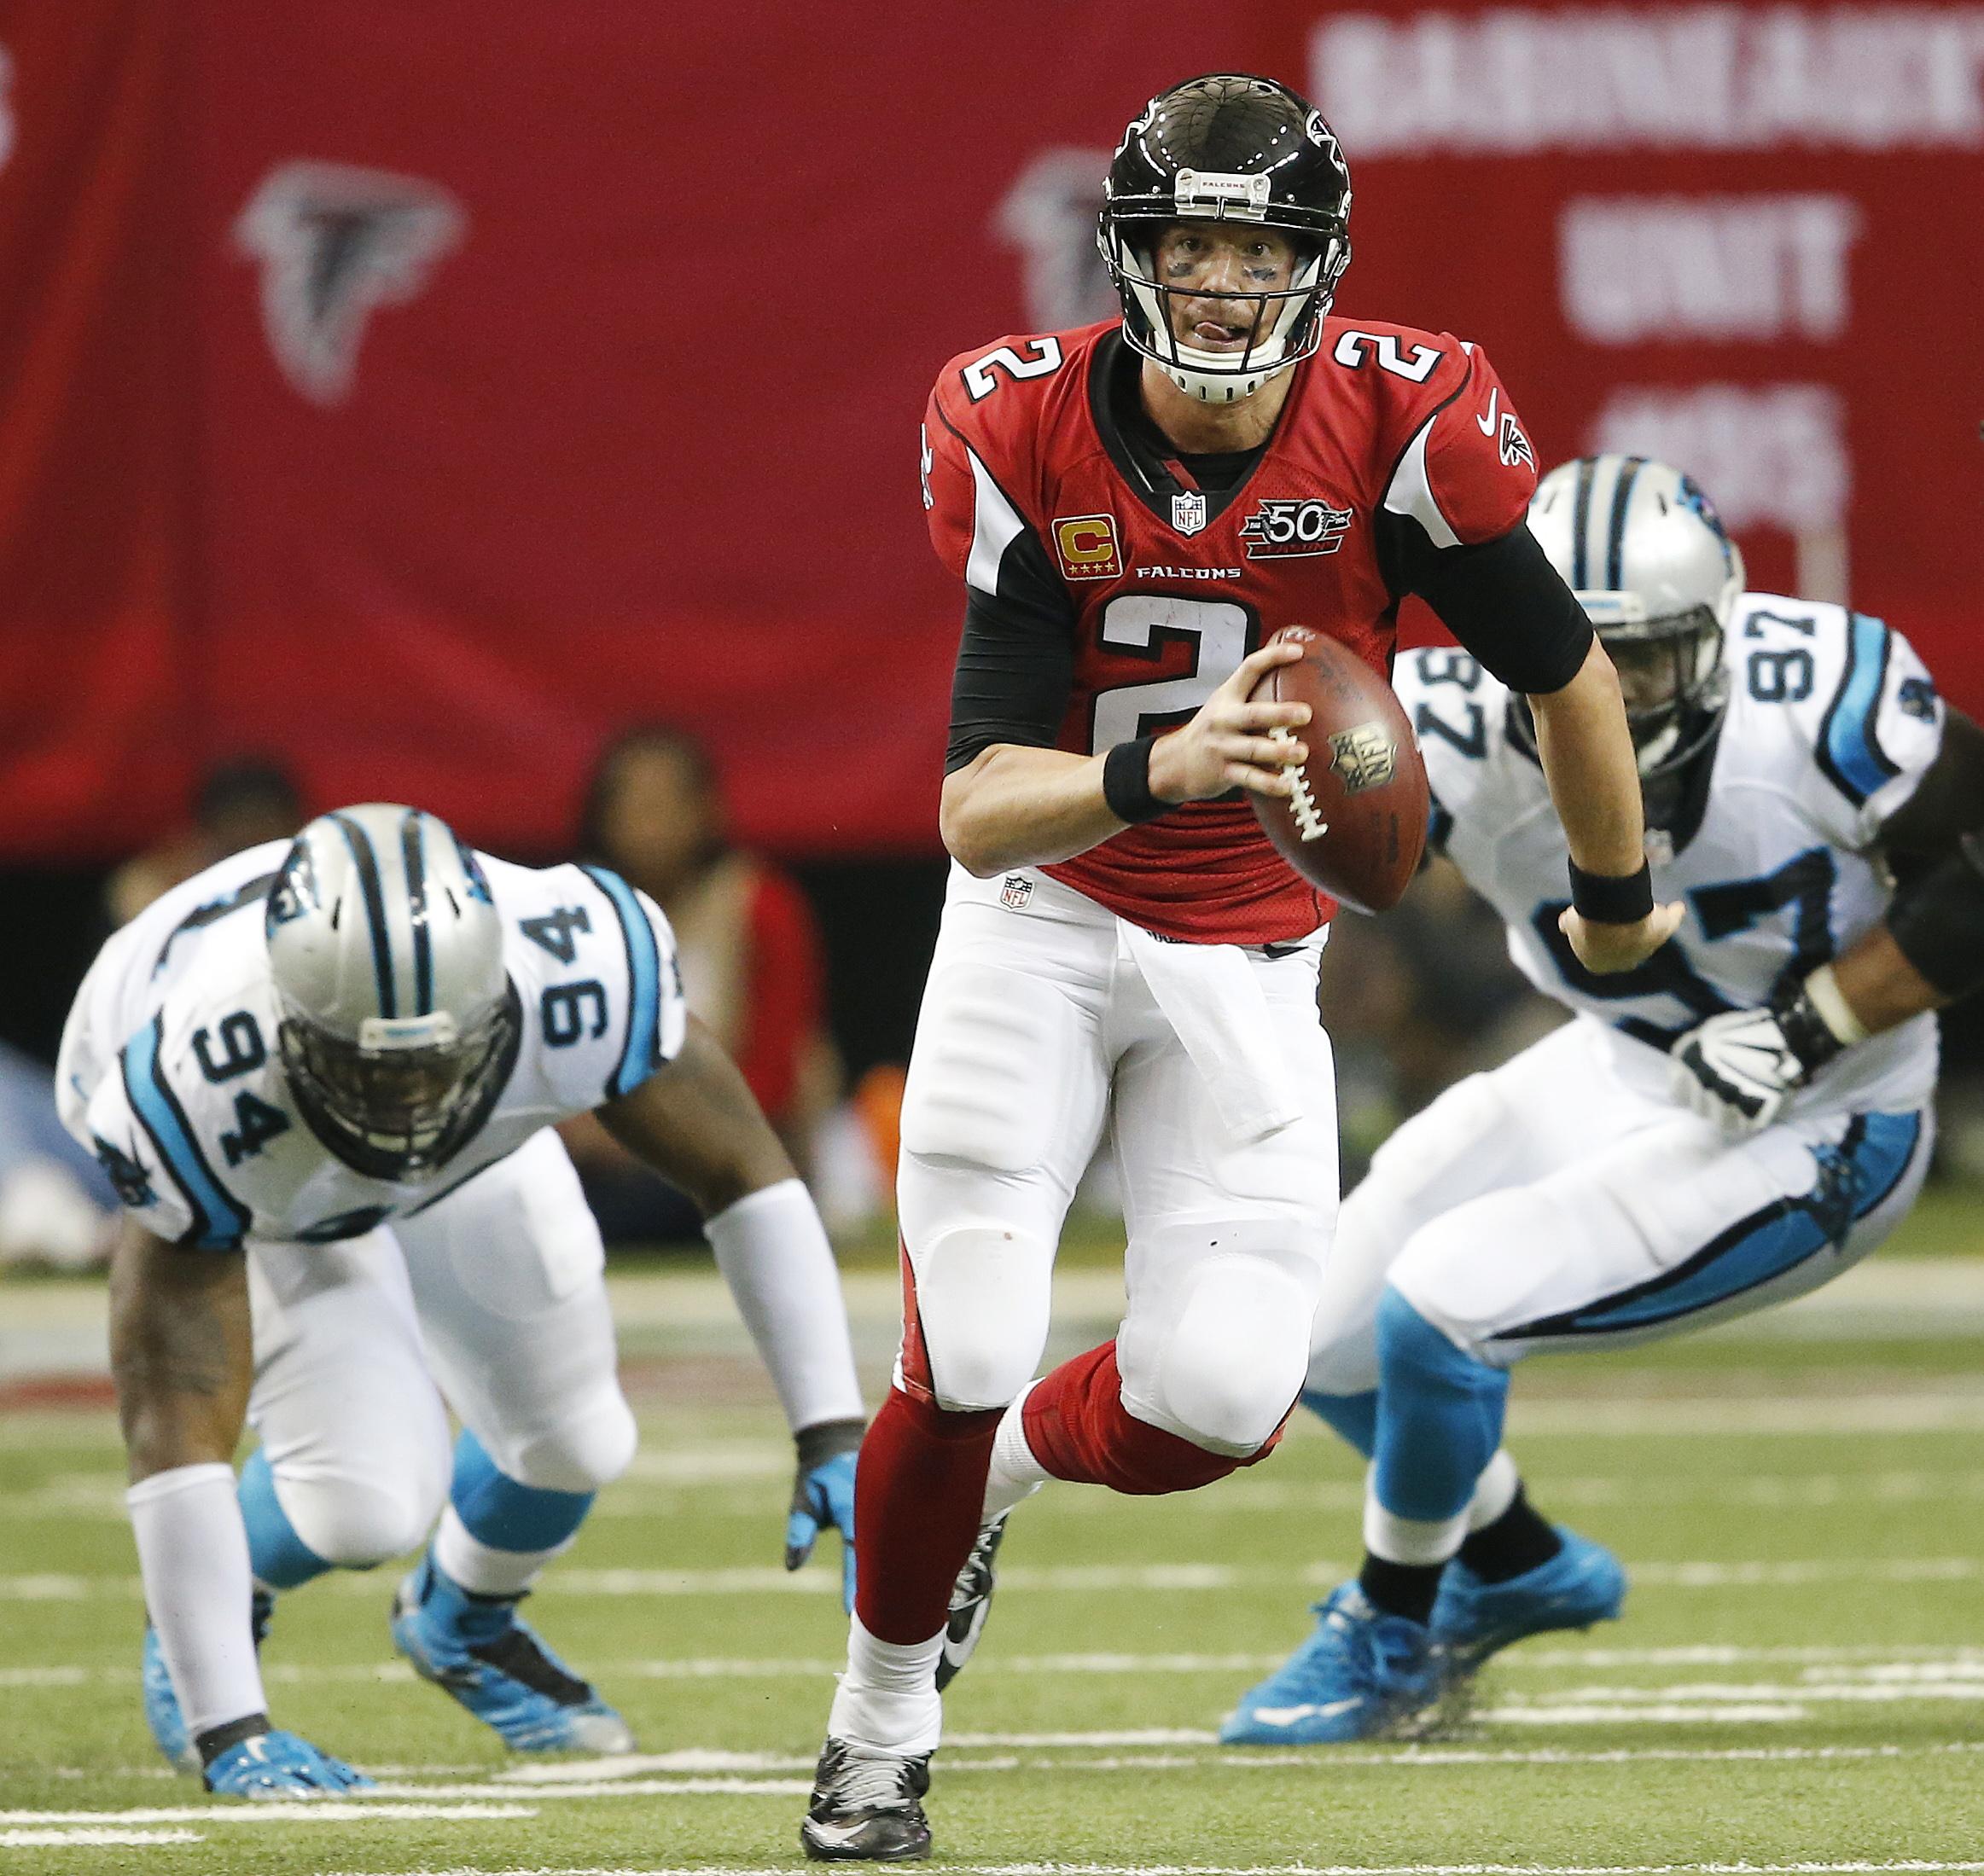 Atlanta Falcons quarterback Matt Ryan (2) runs out of the pocket against the Carolina Panthers during the second half of an NFL football game, Sunday, Dec. 27, 2015, in Atlanta. (AP Photo/John Bazemore)